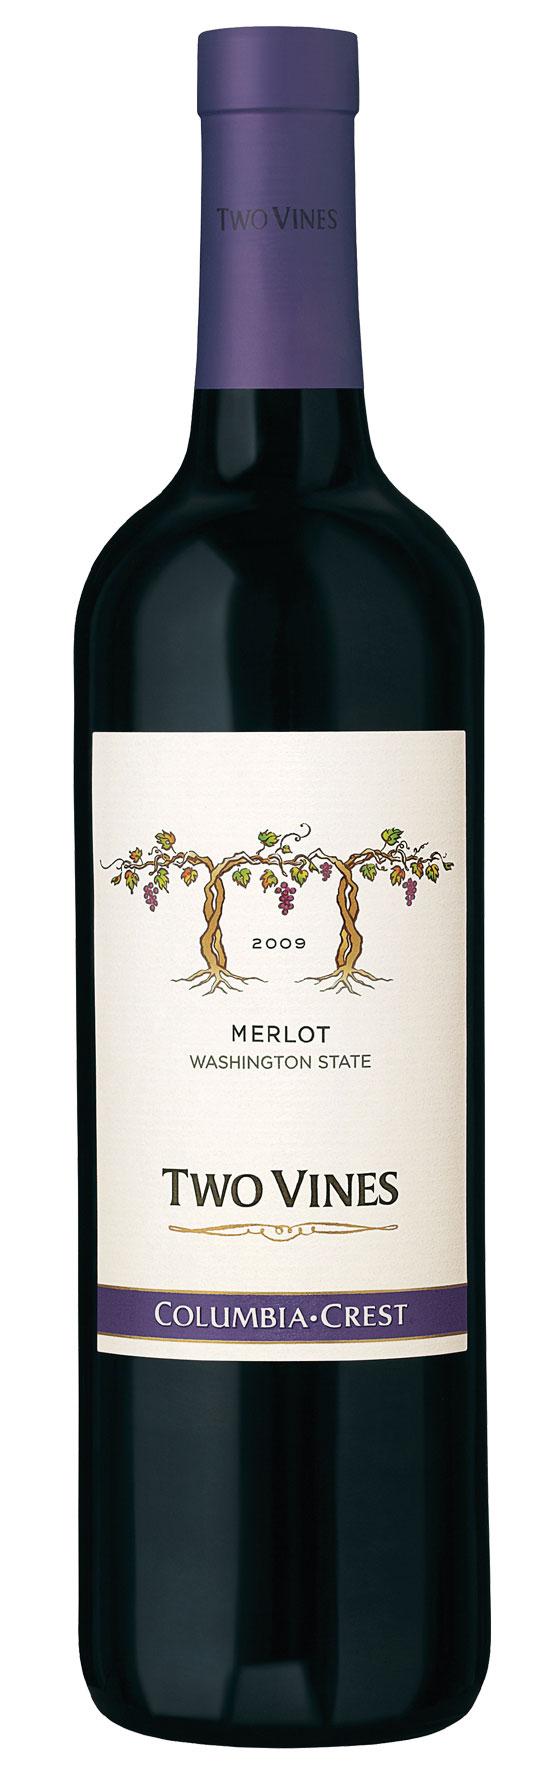 Columbia Crest Two Vines Merlot 2017